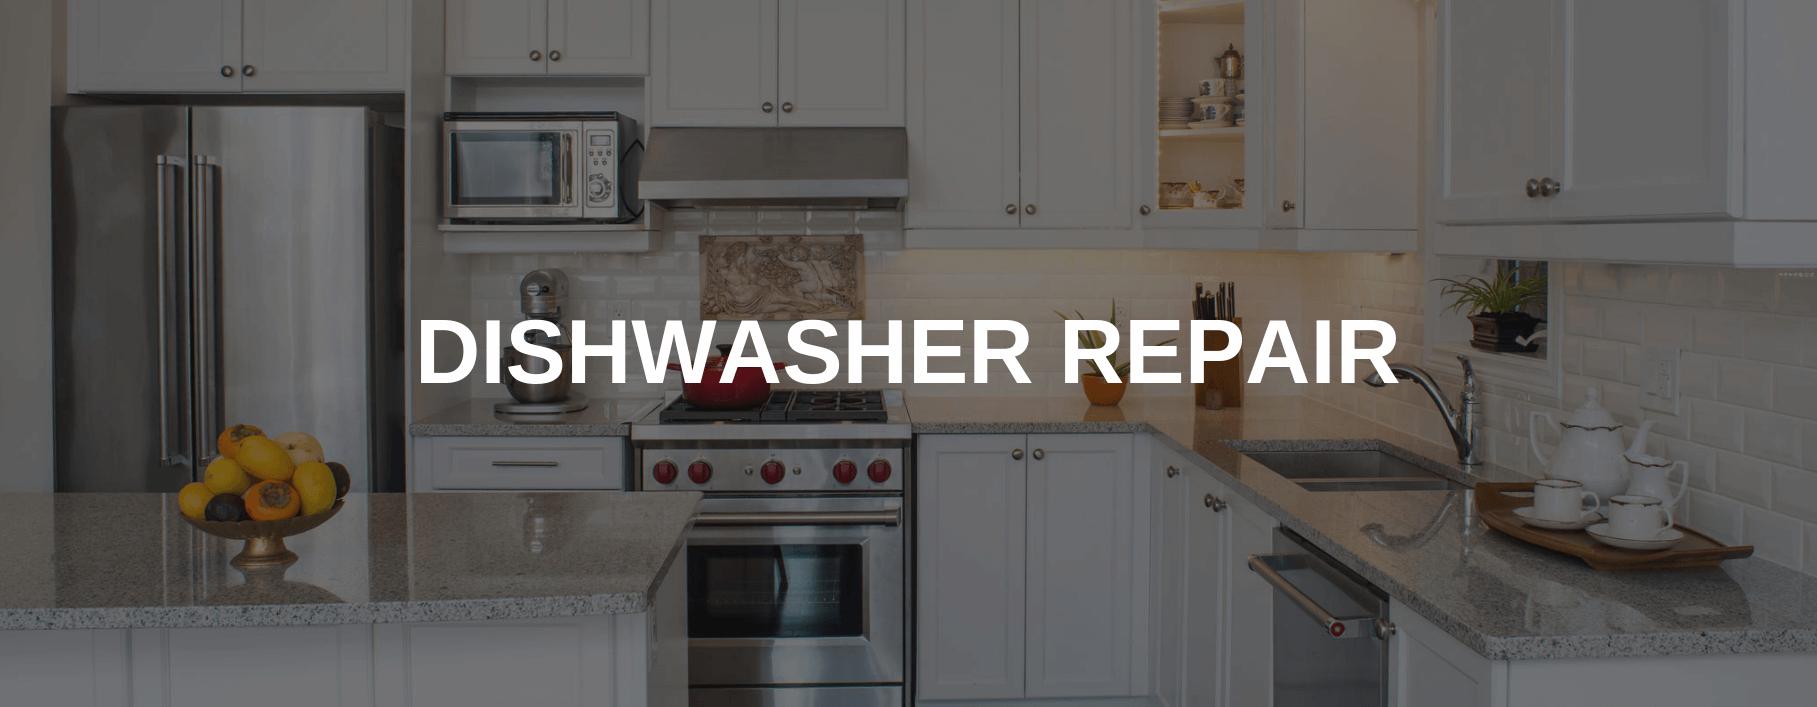 dishwasher repair cary